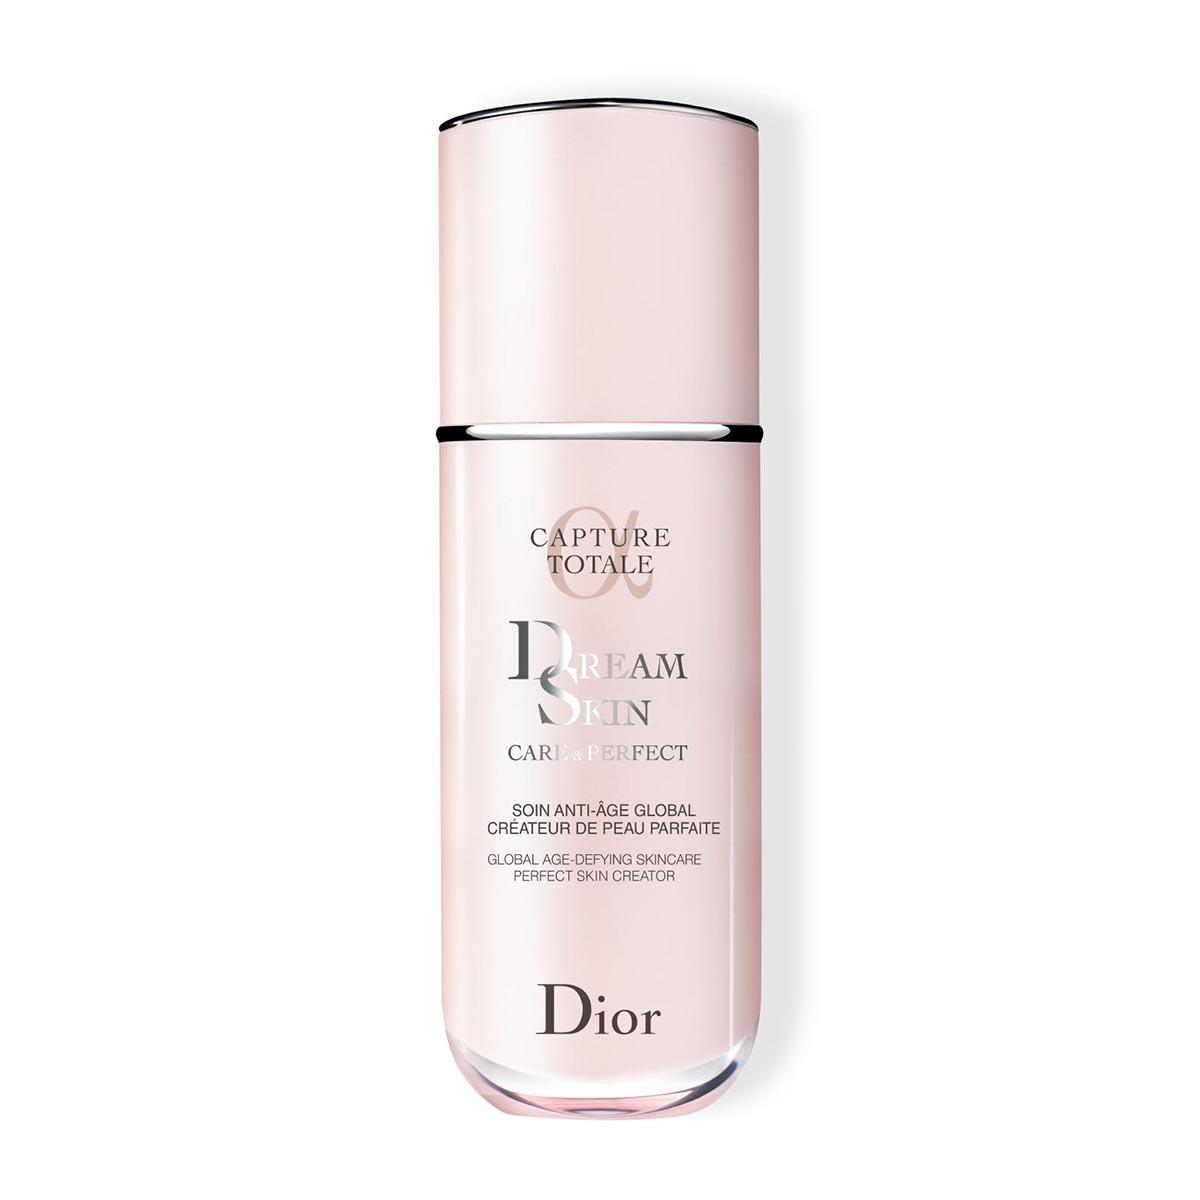 Dior capture totale dream skin care perfect 30ml